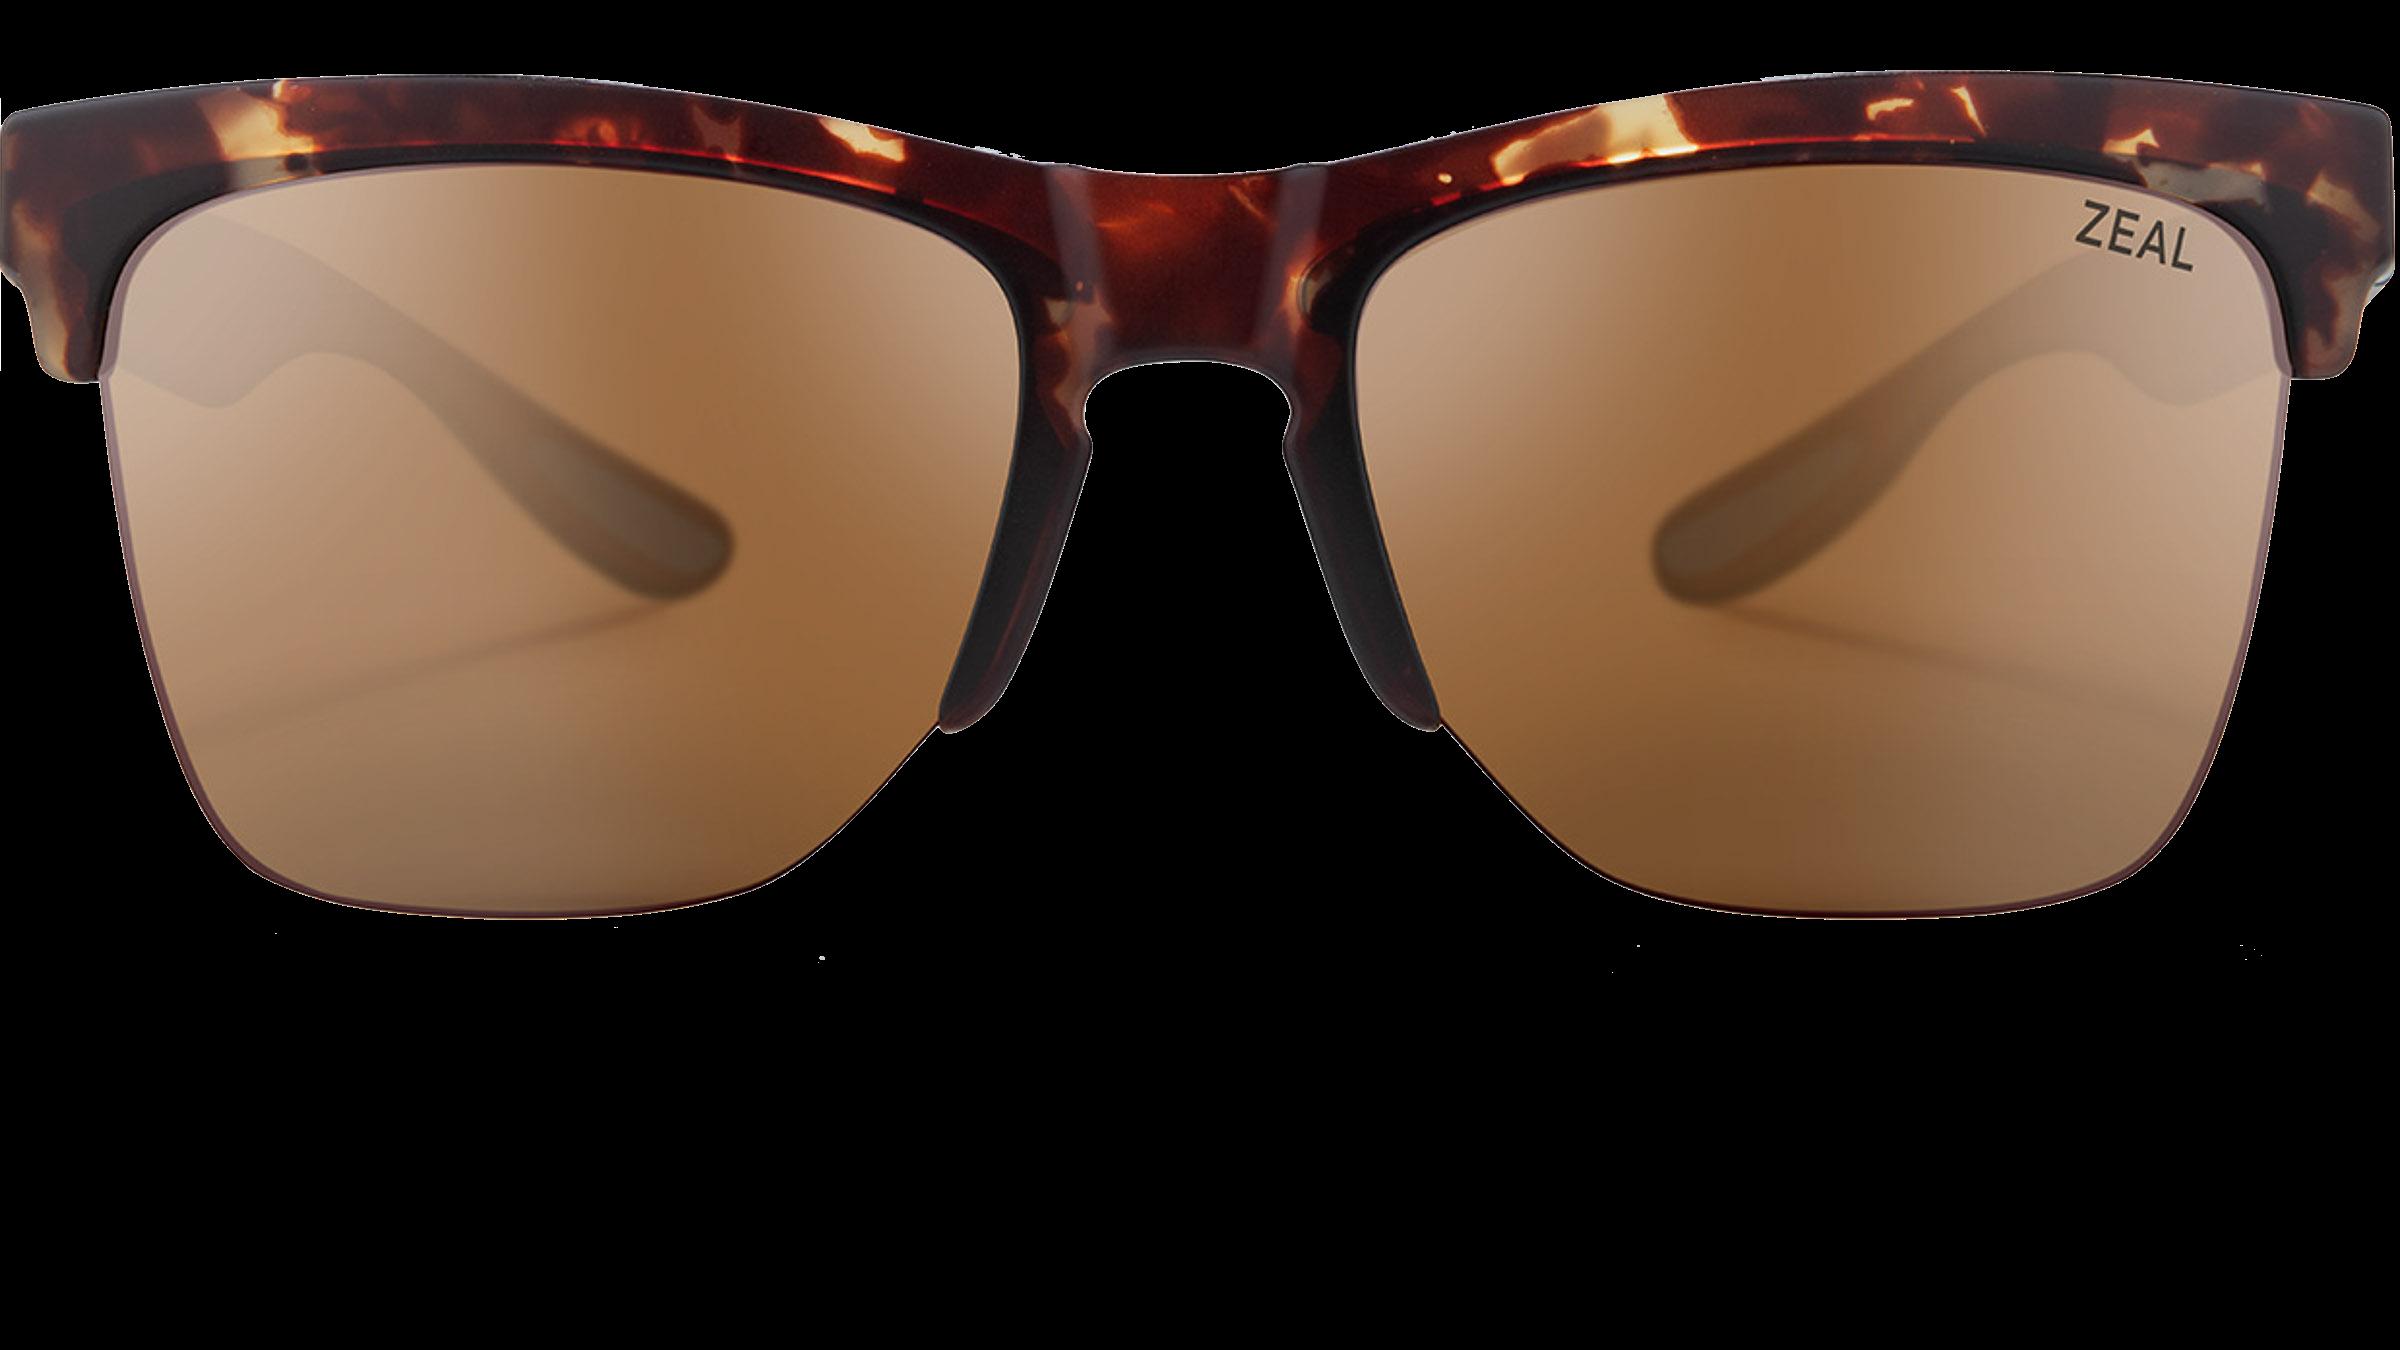 Zeal Palisade sunglasses